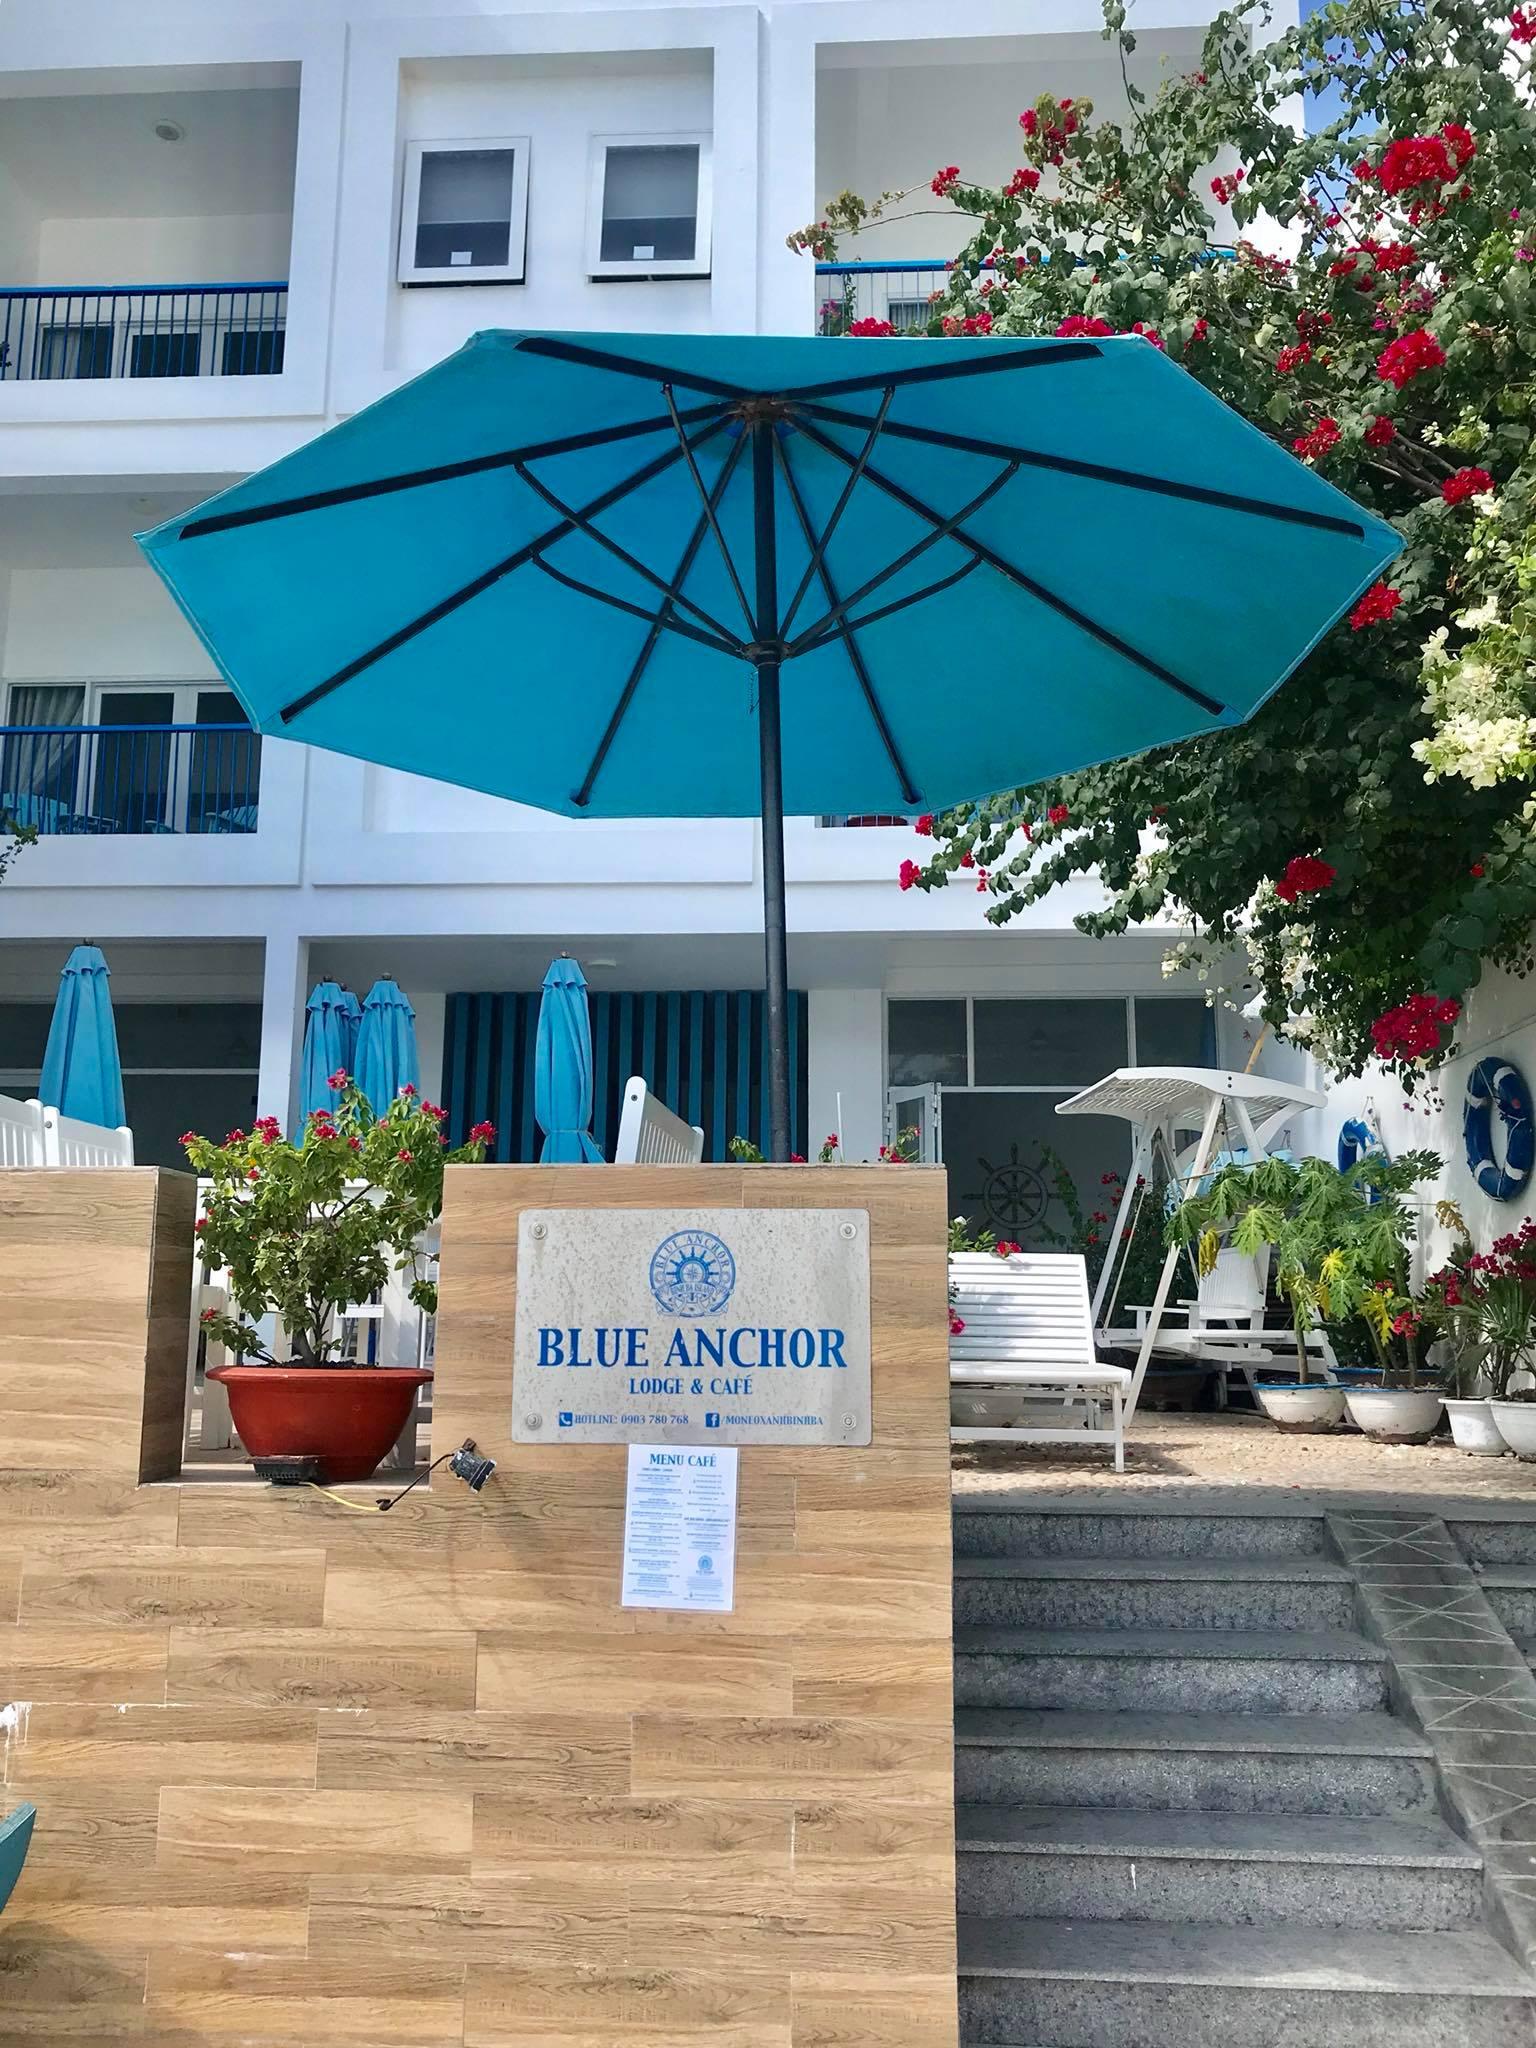 Blue Anchor - Logde & Café - Bình Ba Island